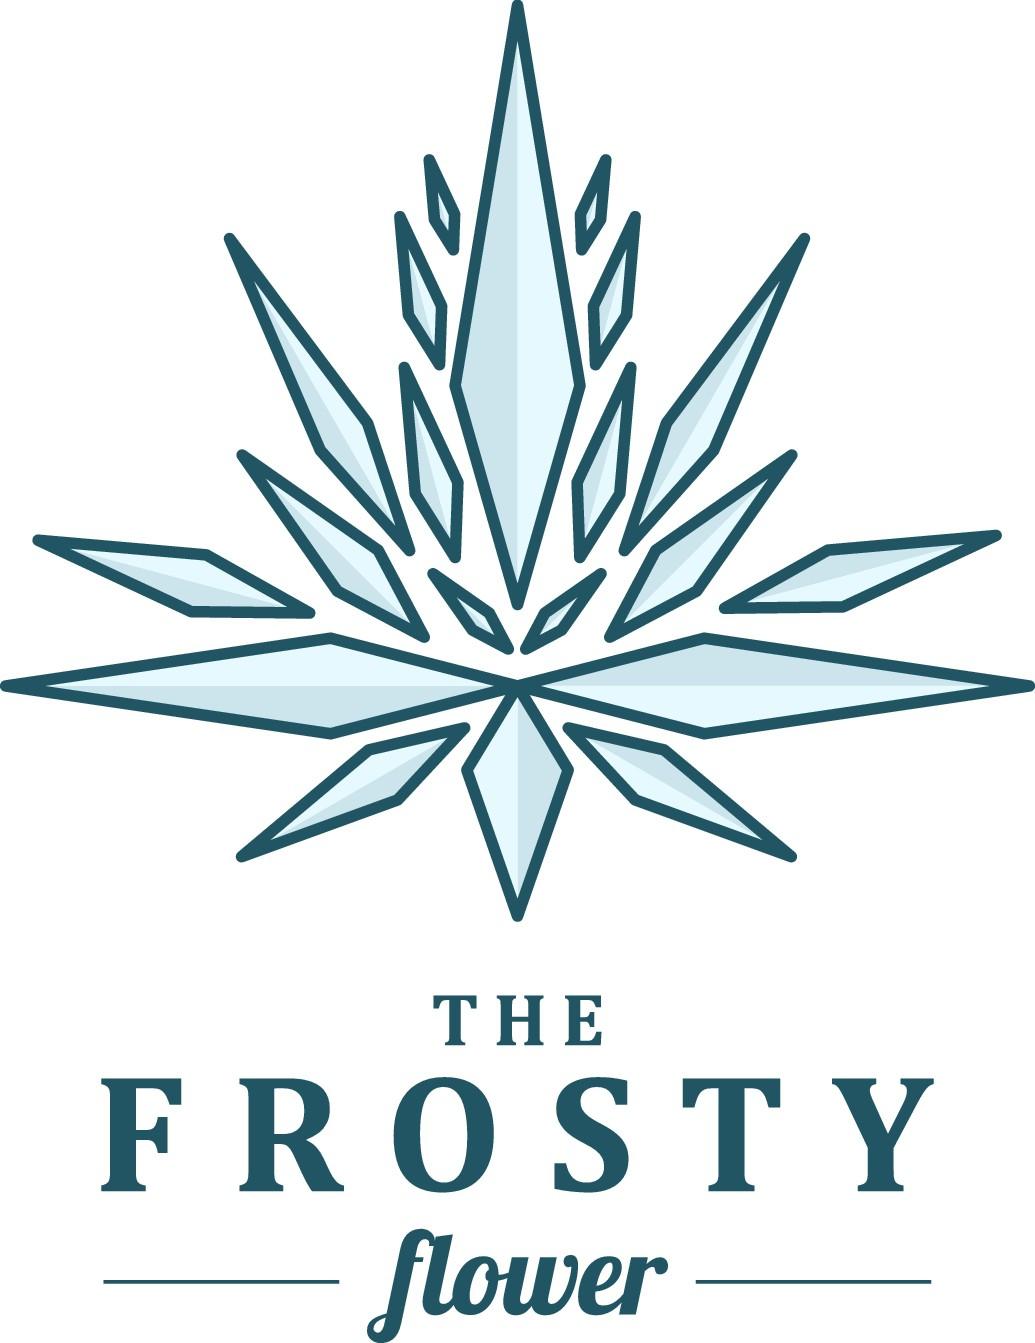 The Frosty Flower